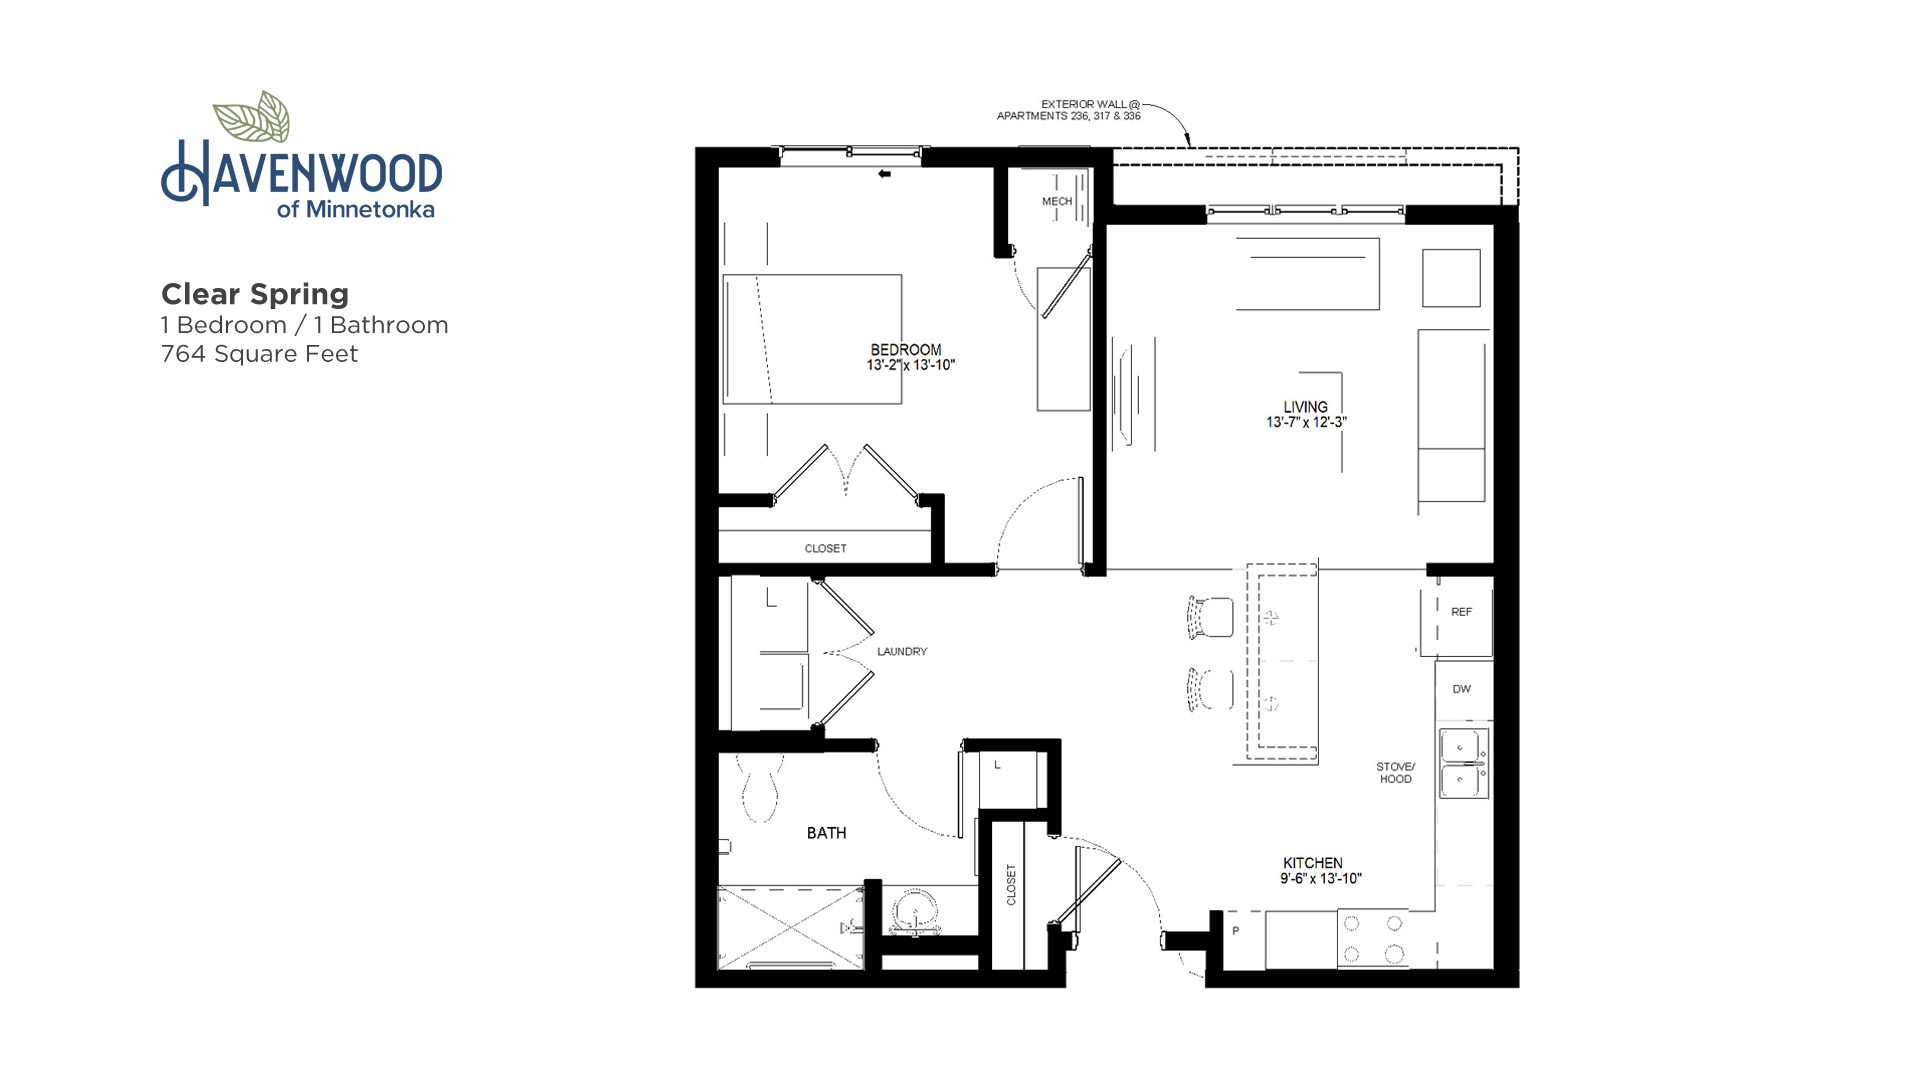 Havenwood of Minnetonka Clear Spring Floor Plan